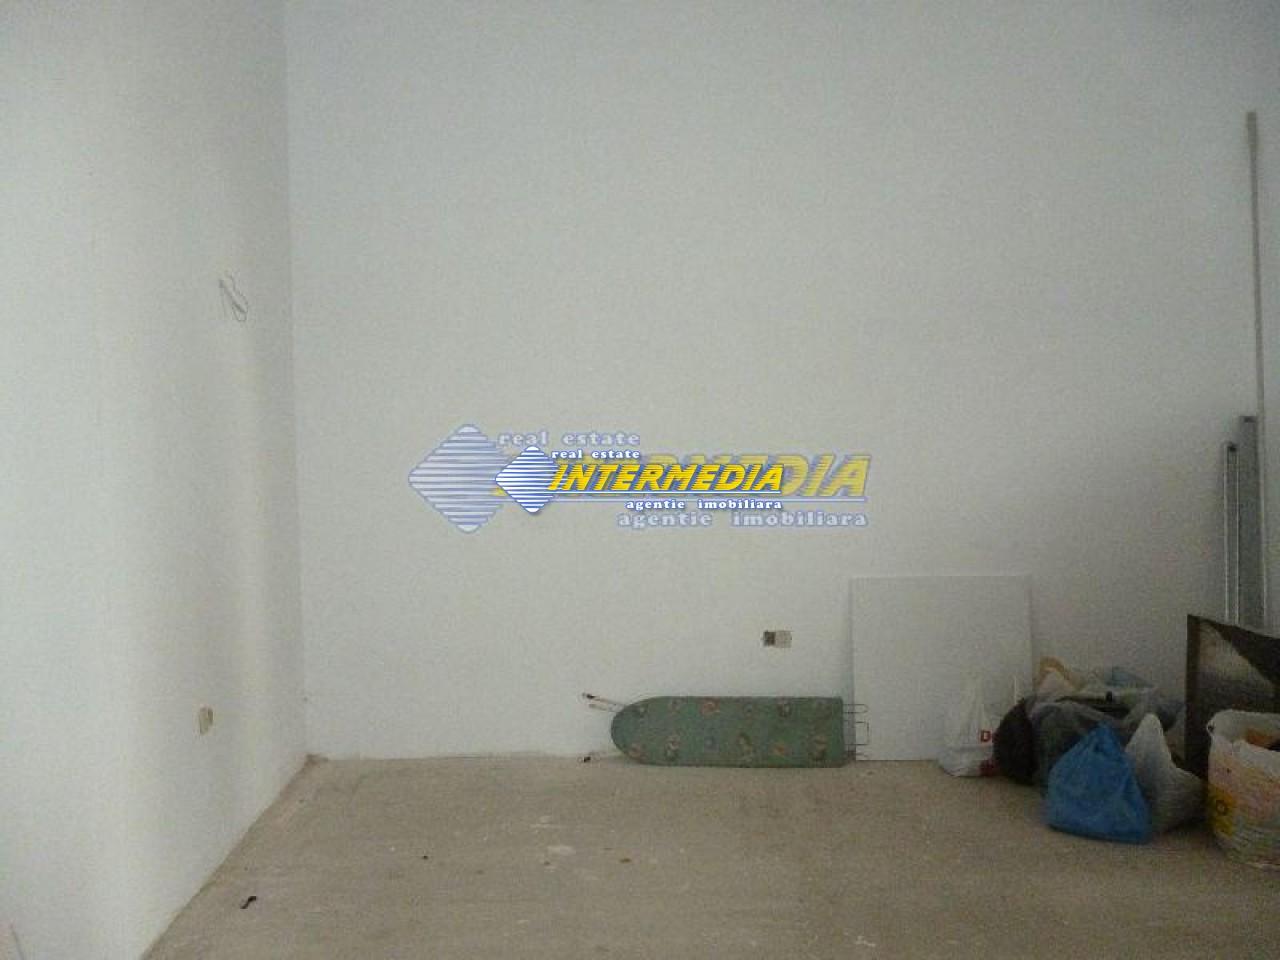 Spatiu Comercial de inchiriat Centru 60 mp-17232-2